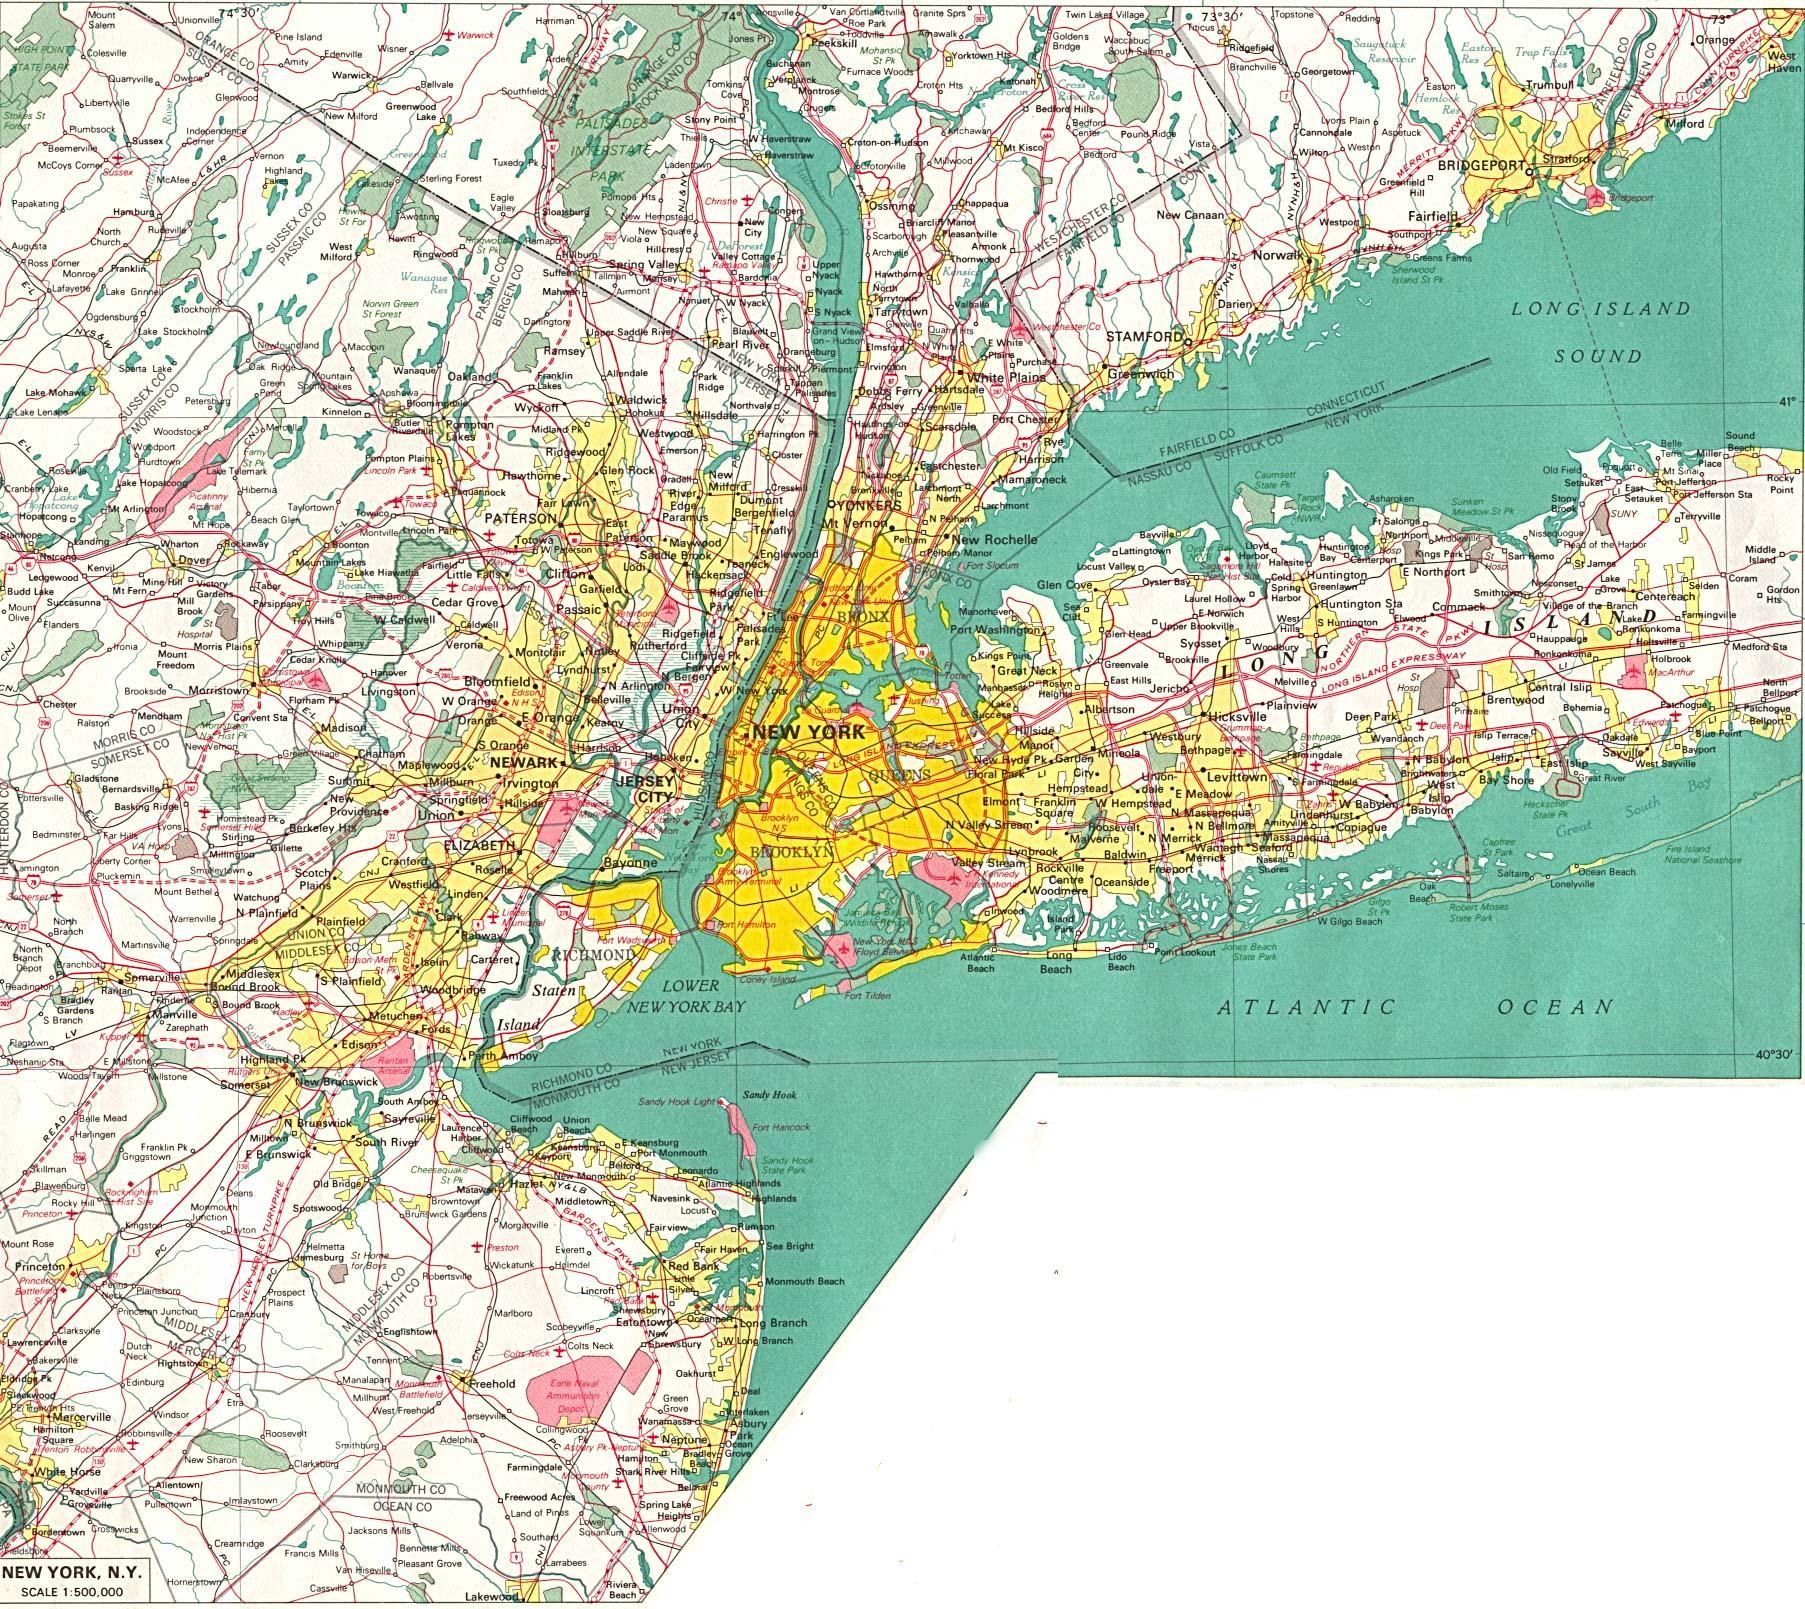 New York on map New York location on map New York USA